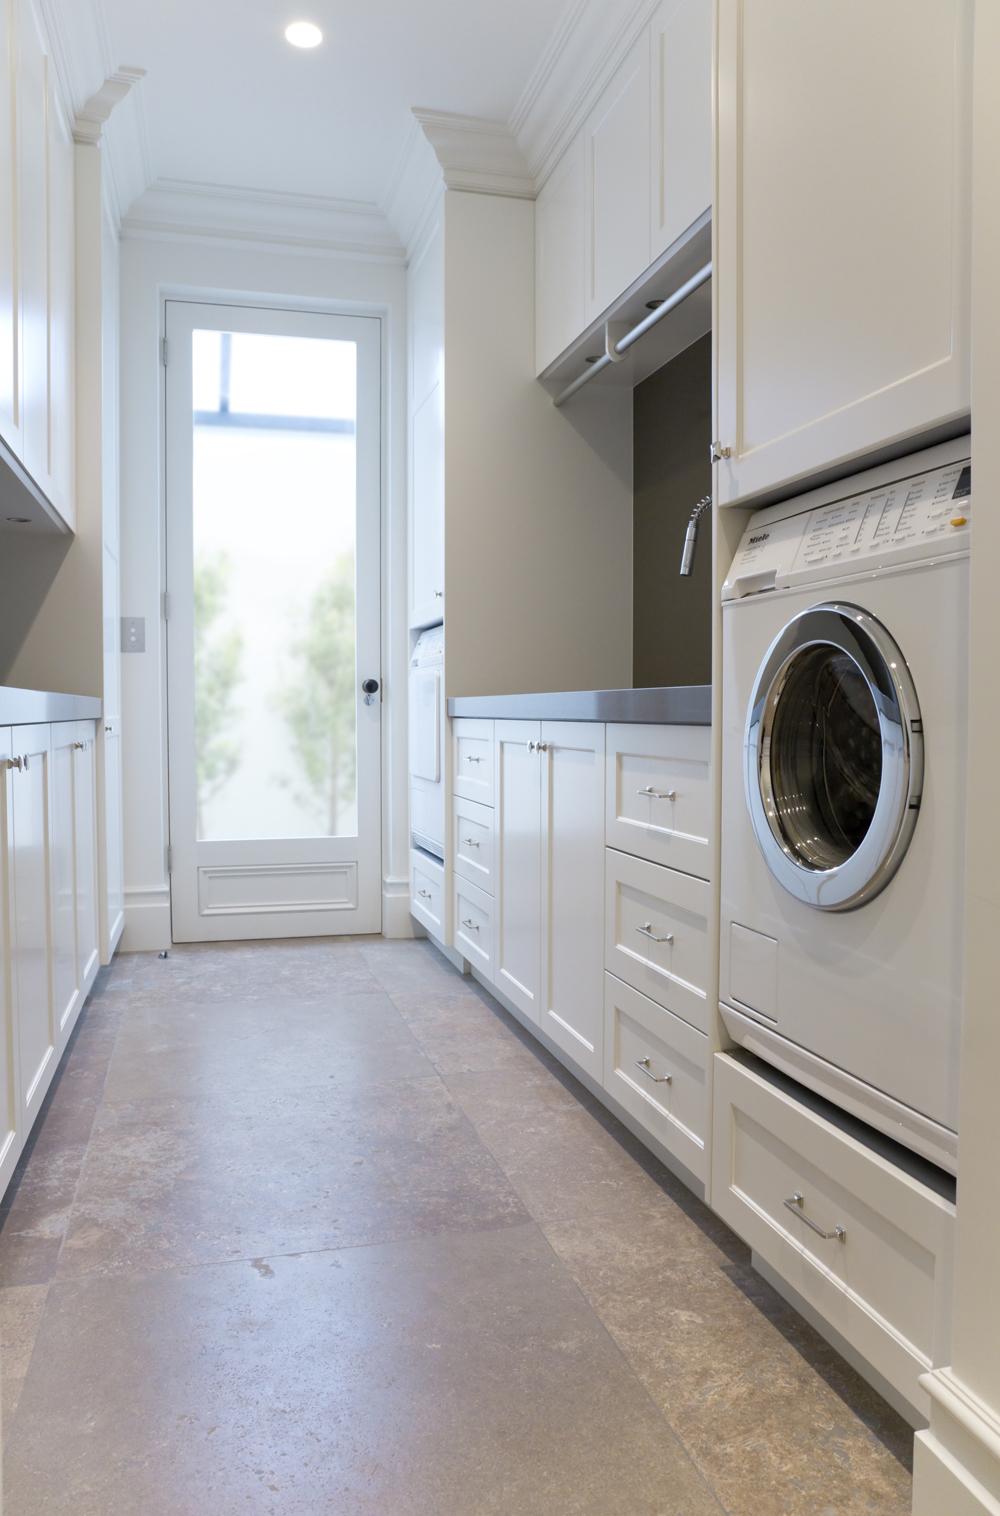 Kitchen Laundry Room Design: Transform Your Laundry Into A Beautiful Multi-purpose Hub